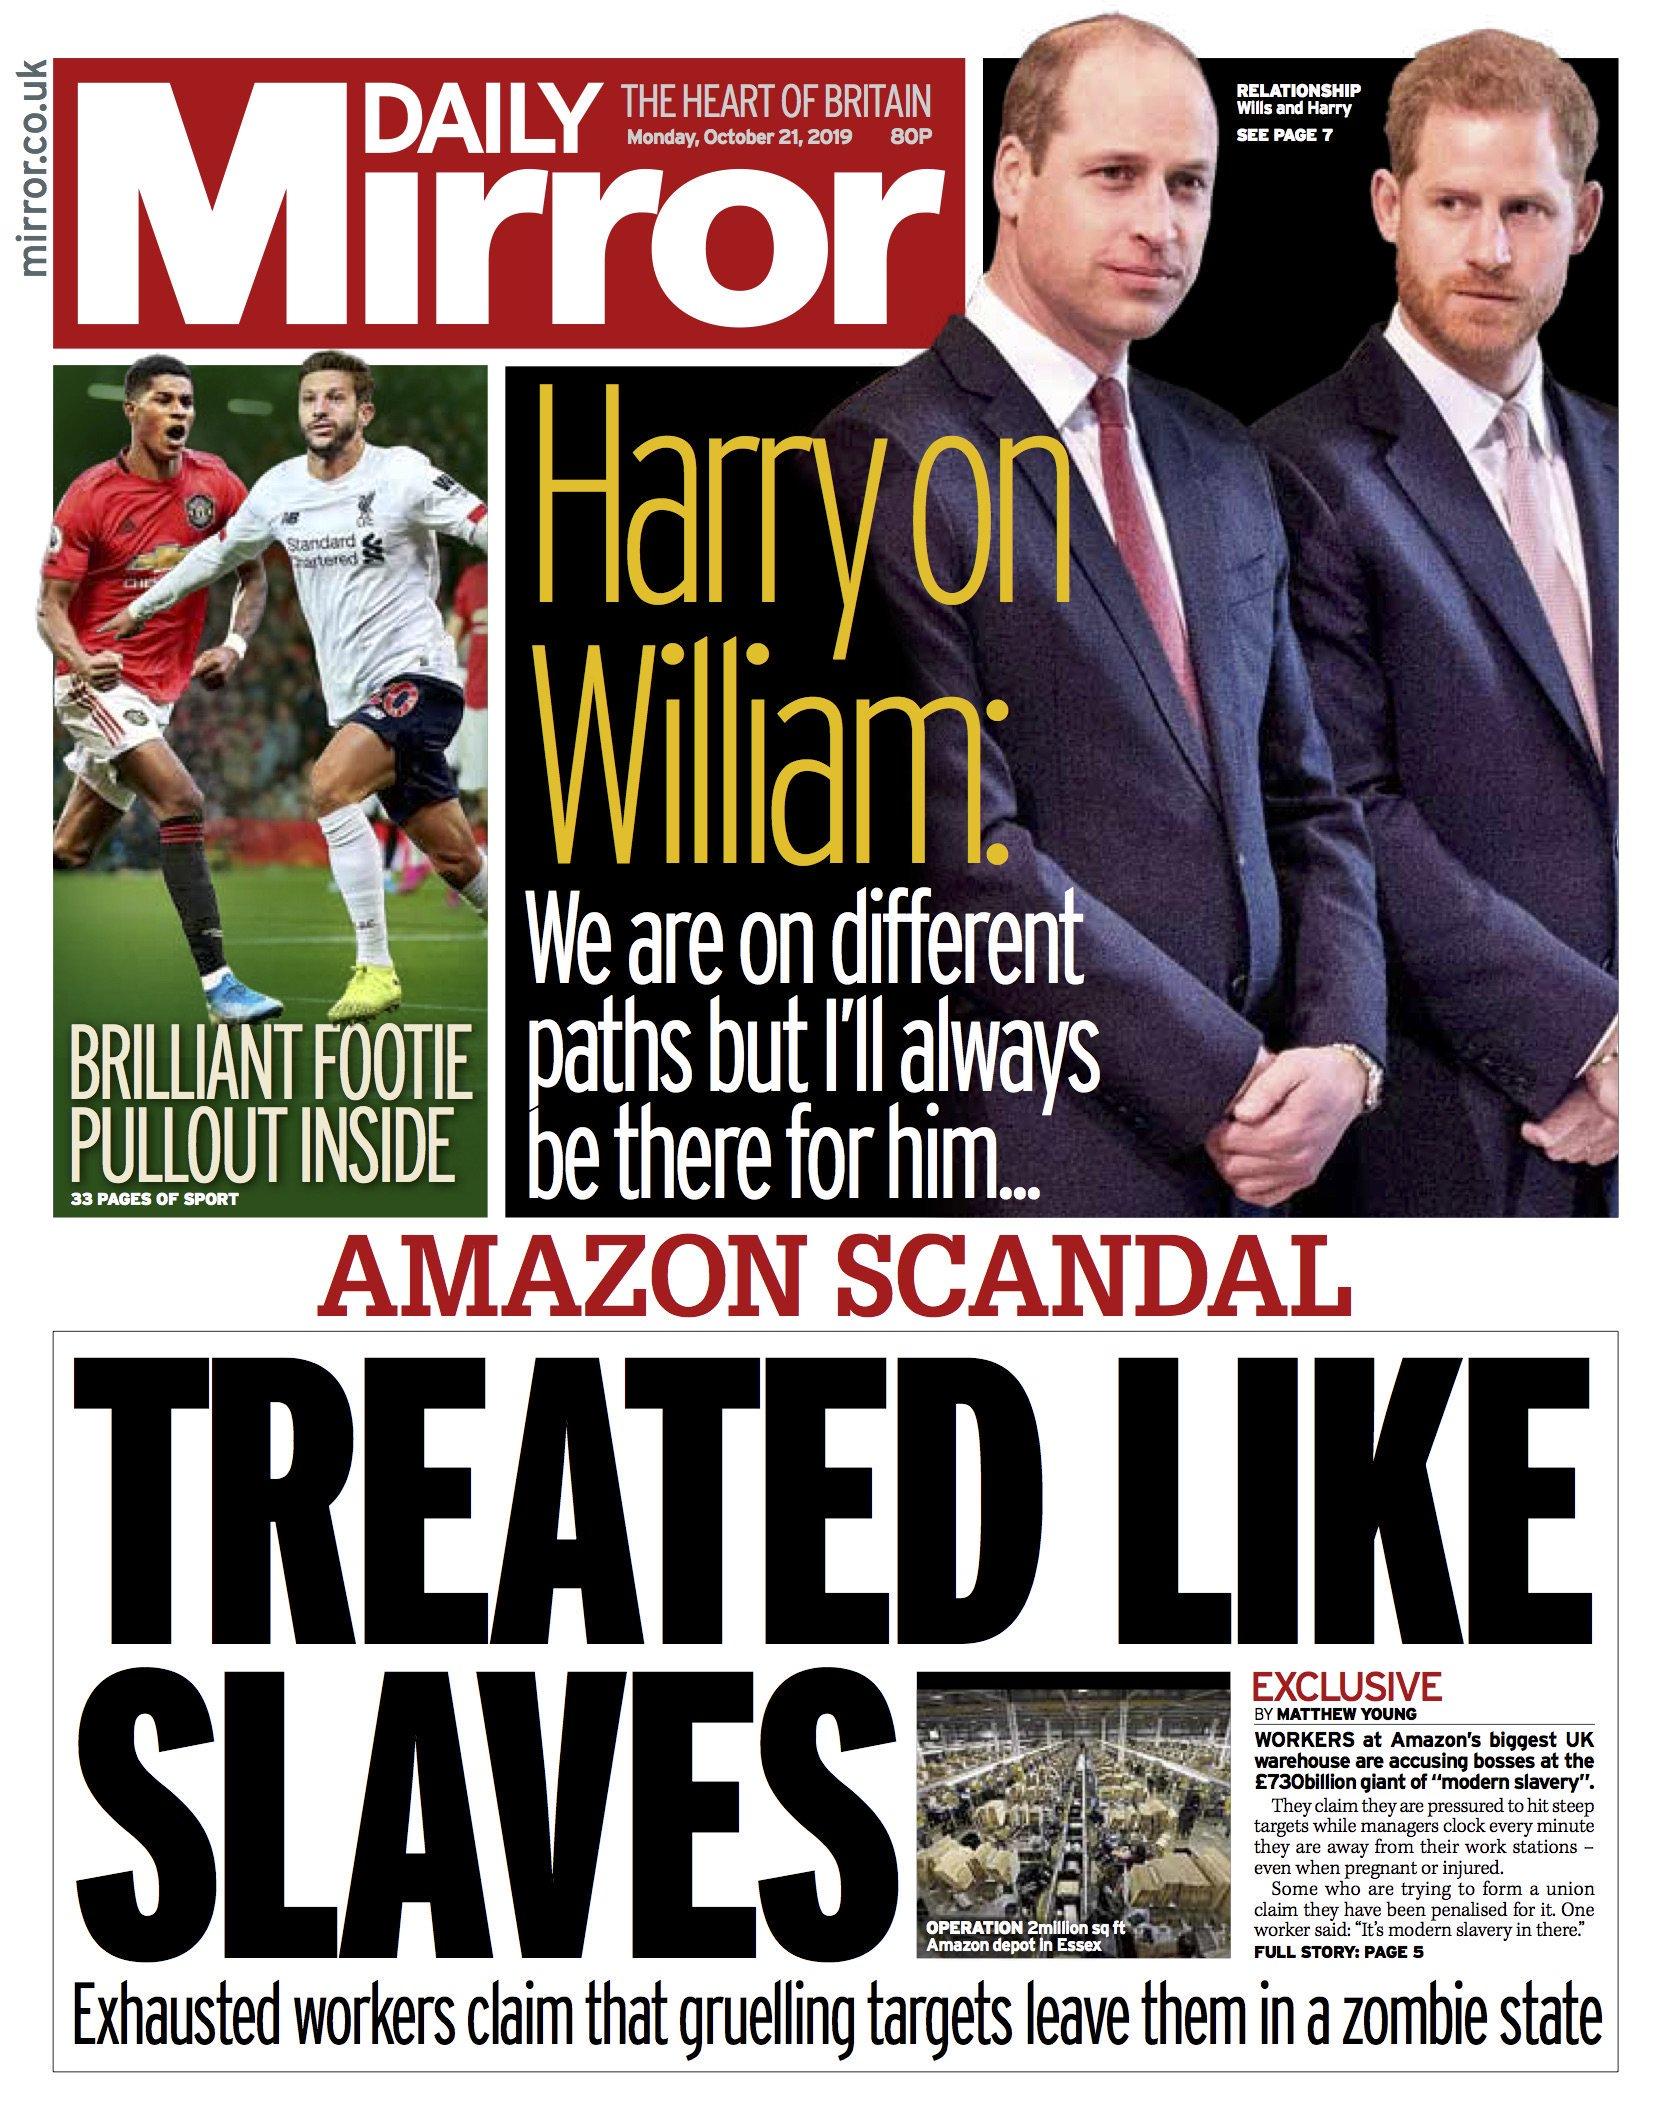 Amazon campaign in the Daily Mirror